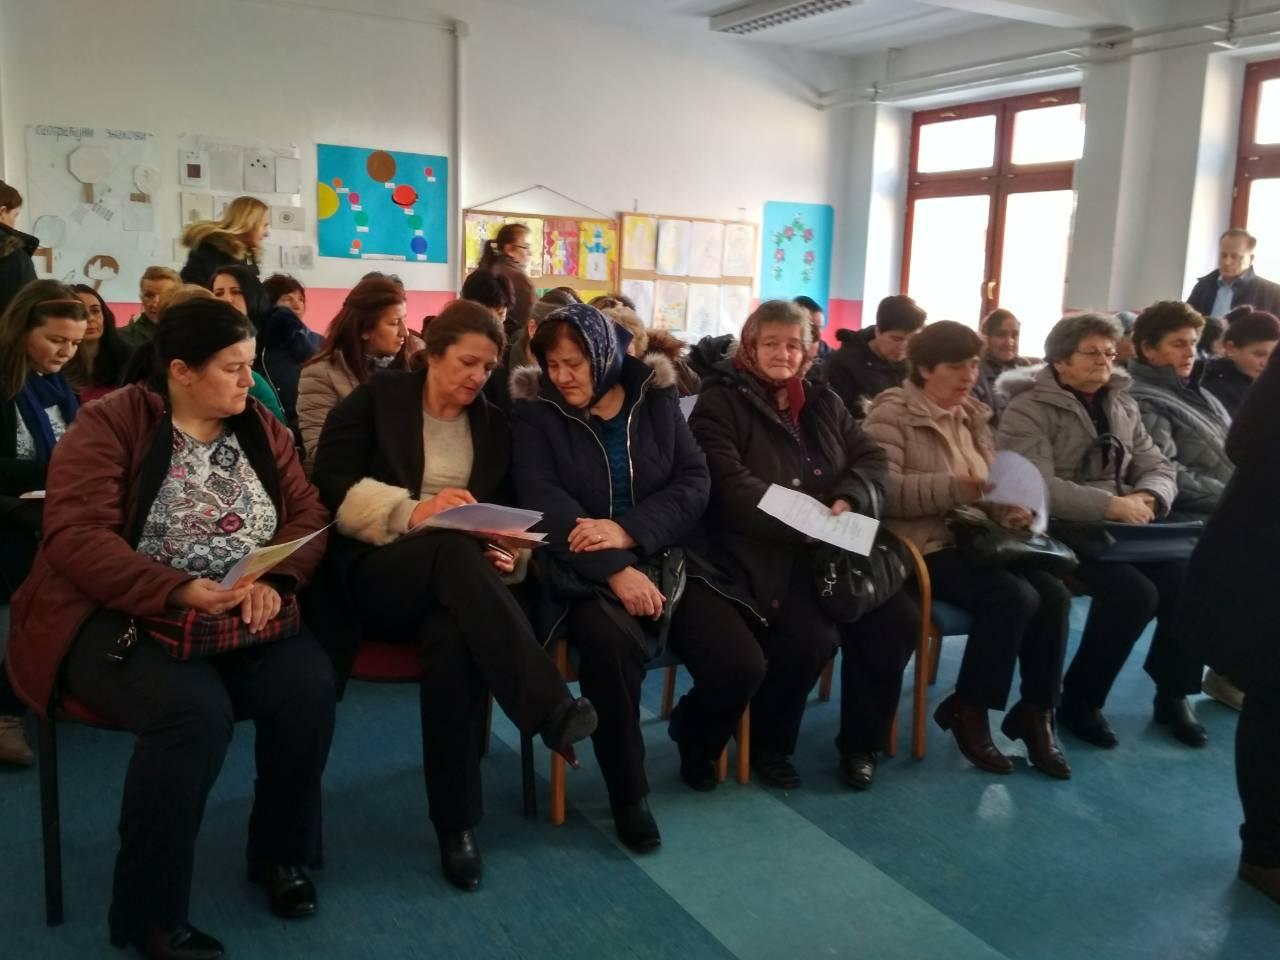 Превенција и жаштита здравља жена-предавање и бесплатни мамографски прегледи за 110 жена у Подрашници